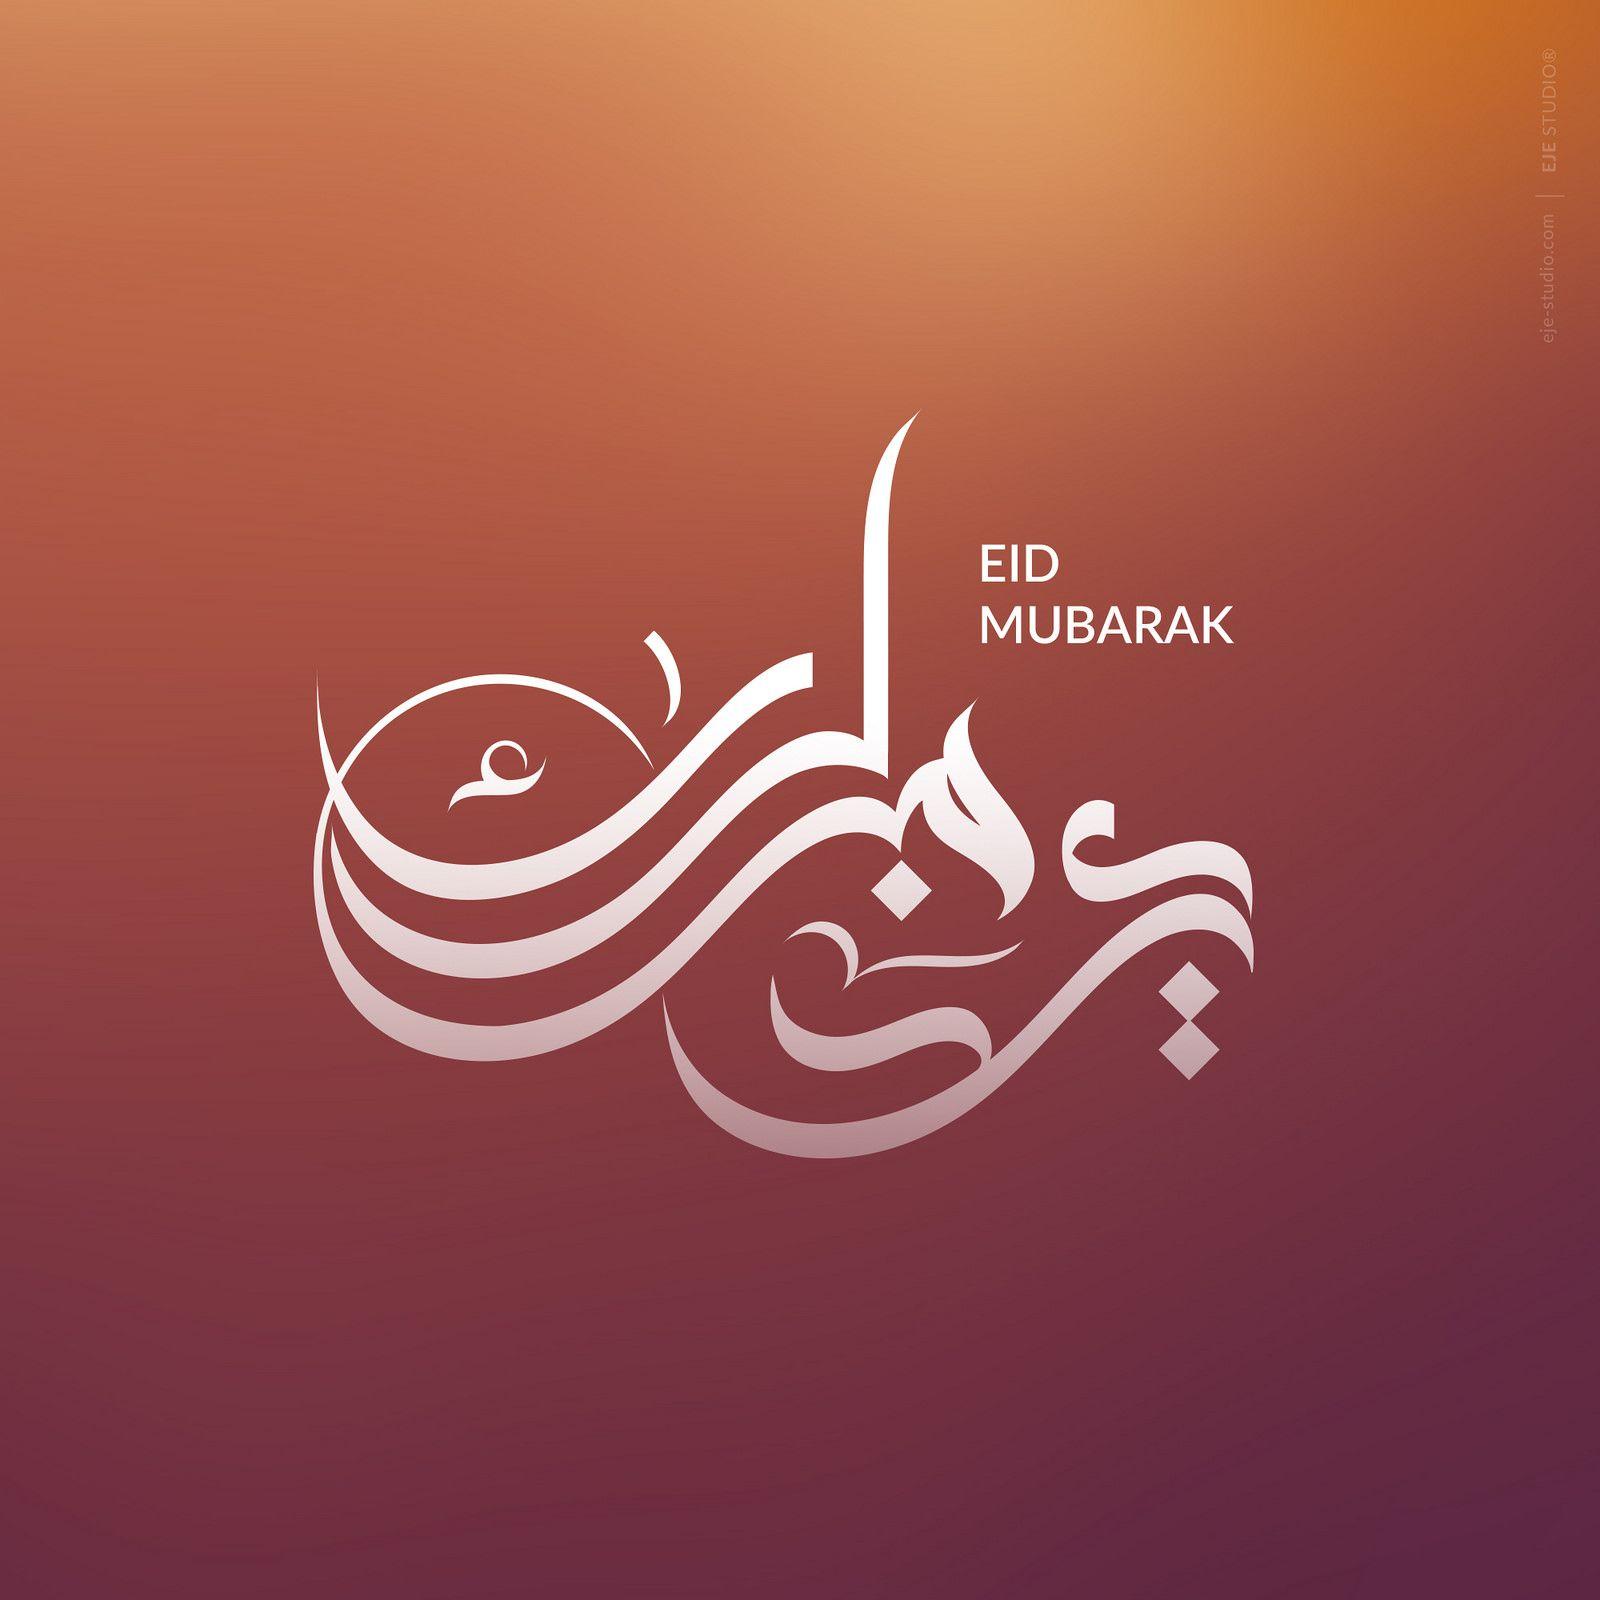 Eid Modern Arabic Calligraphy By Eje Studio Ebrahim Jaffar Arabic Calligraphy Islamic Calligraphy Calligraphy